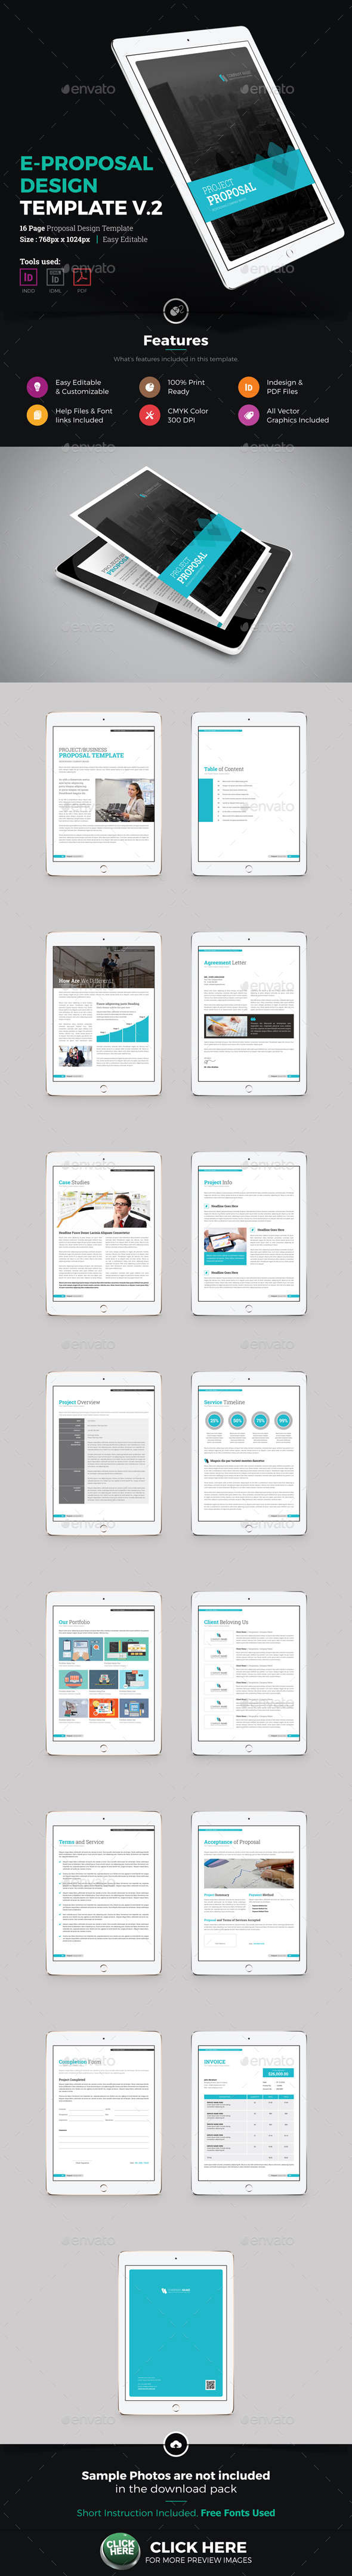 E-Proposal Design v2 - Digital Books ePublishing